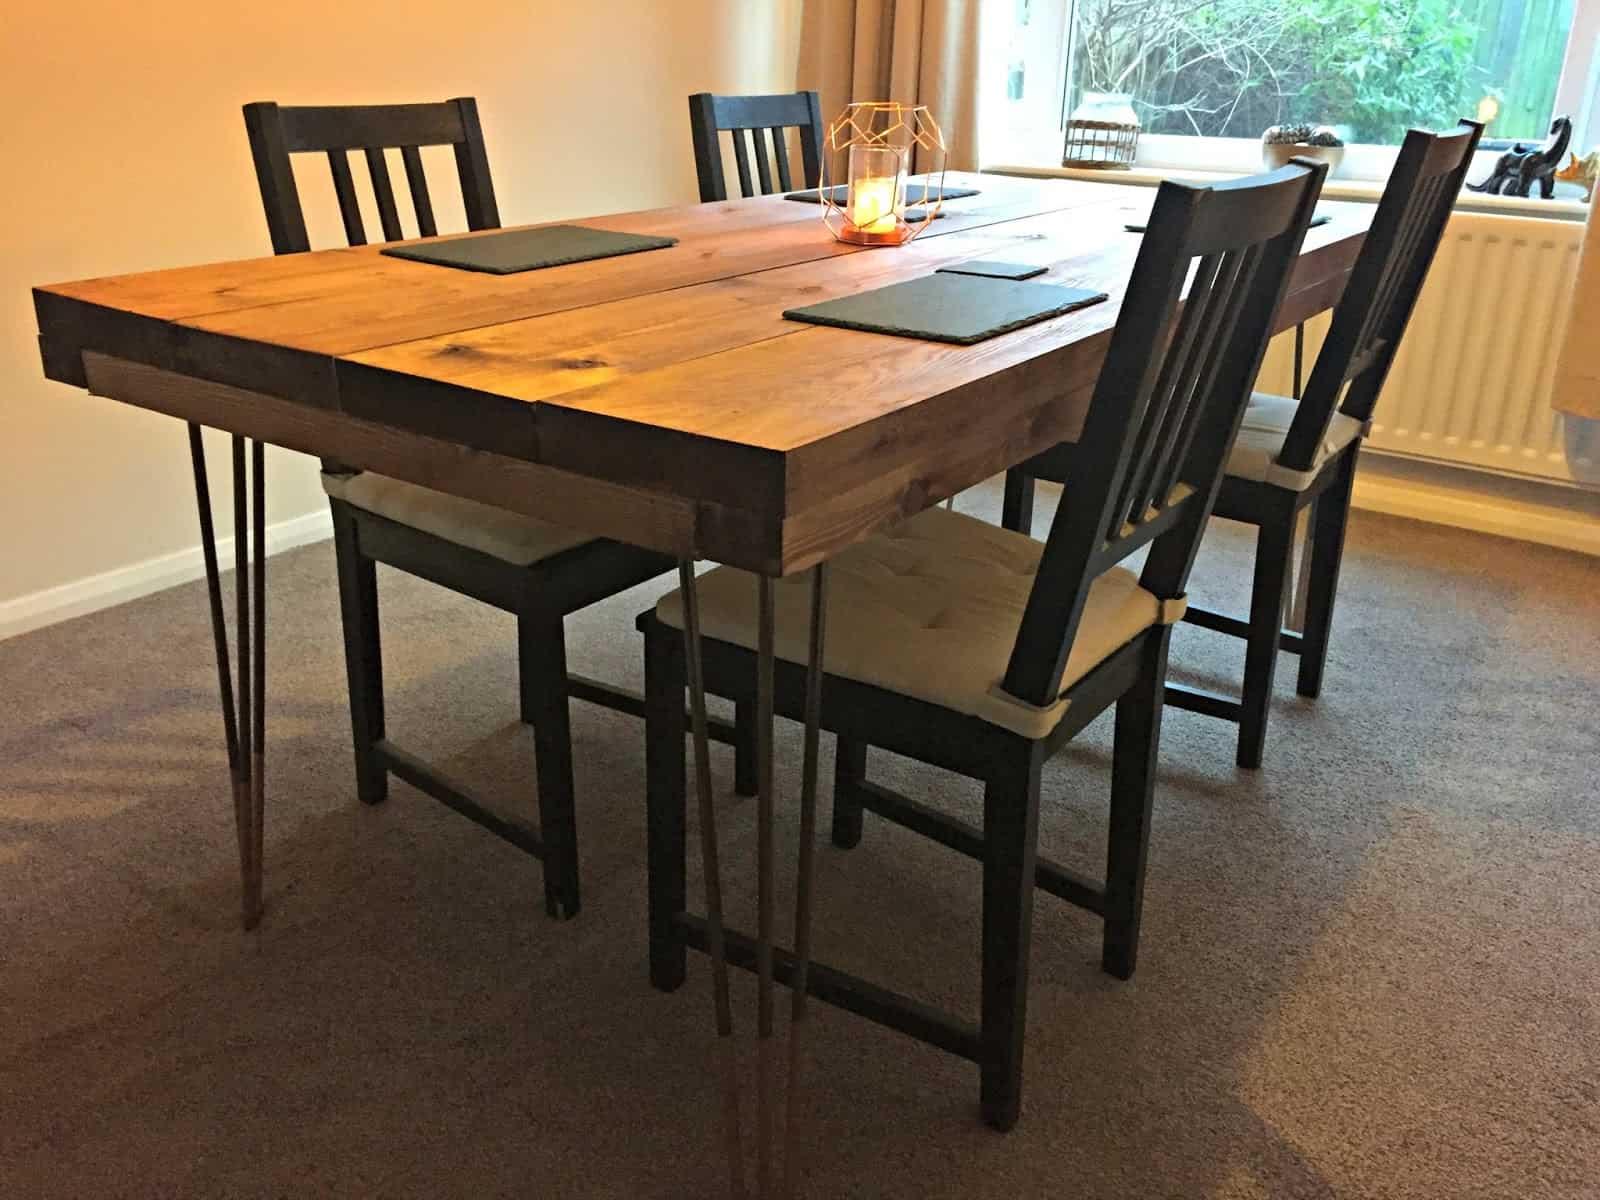 DIY Rustic Dining Table Tutorial